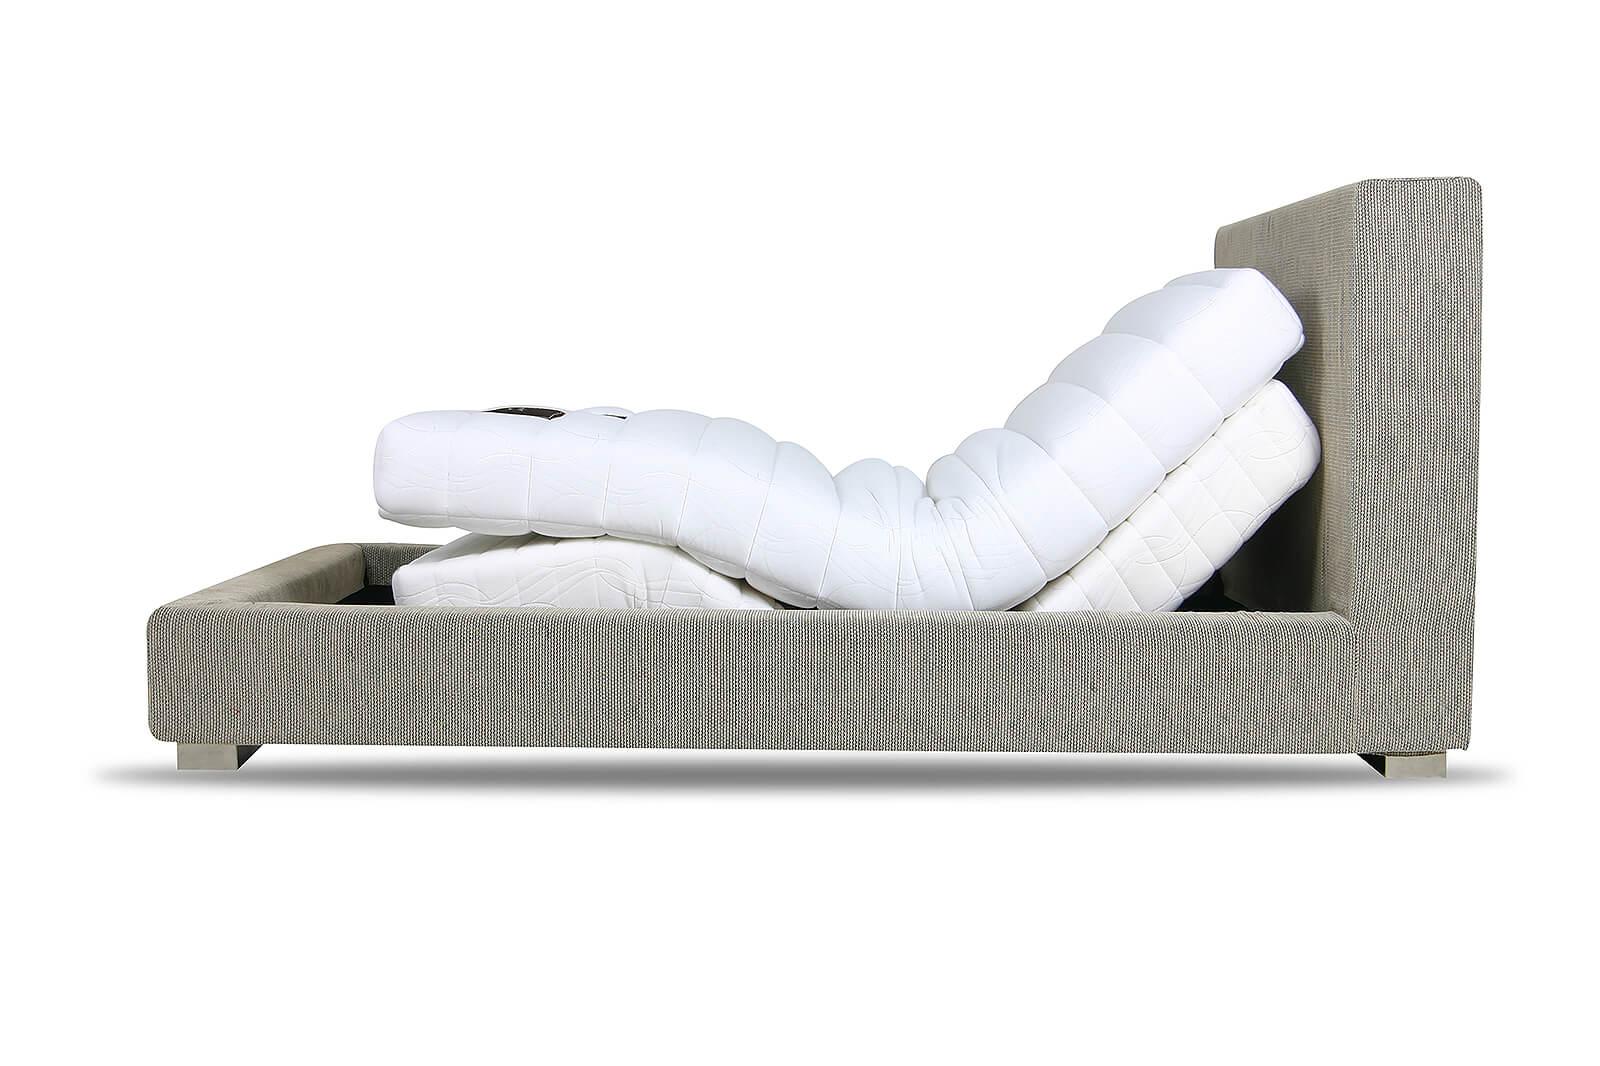 Omazz Adjusto Bed